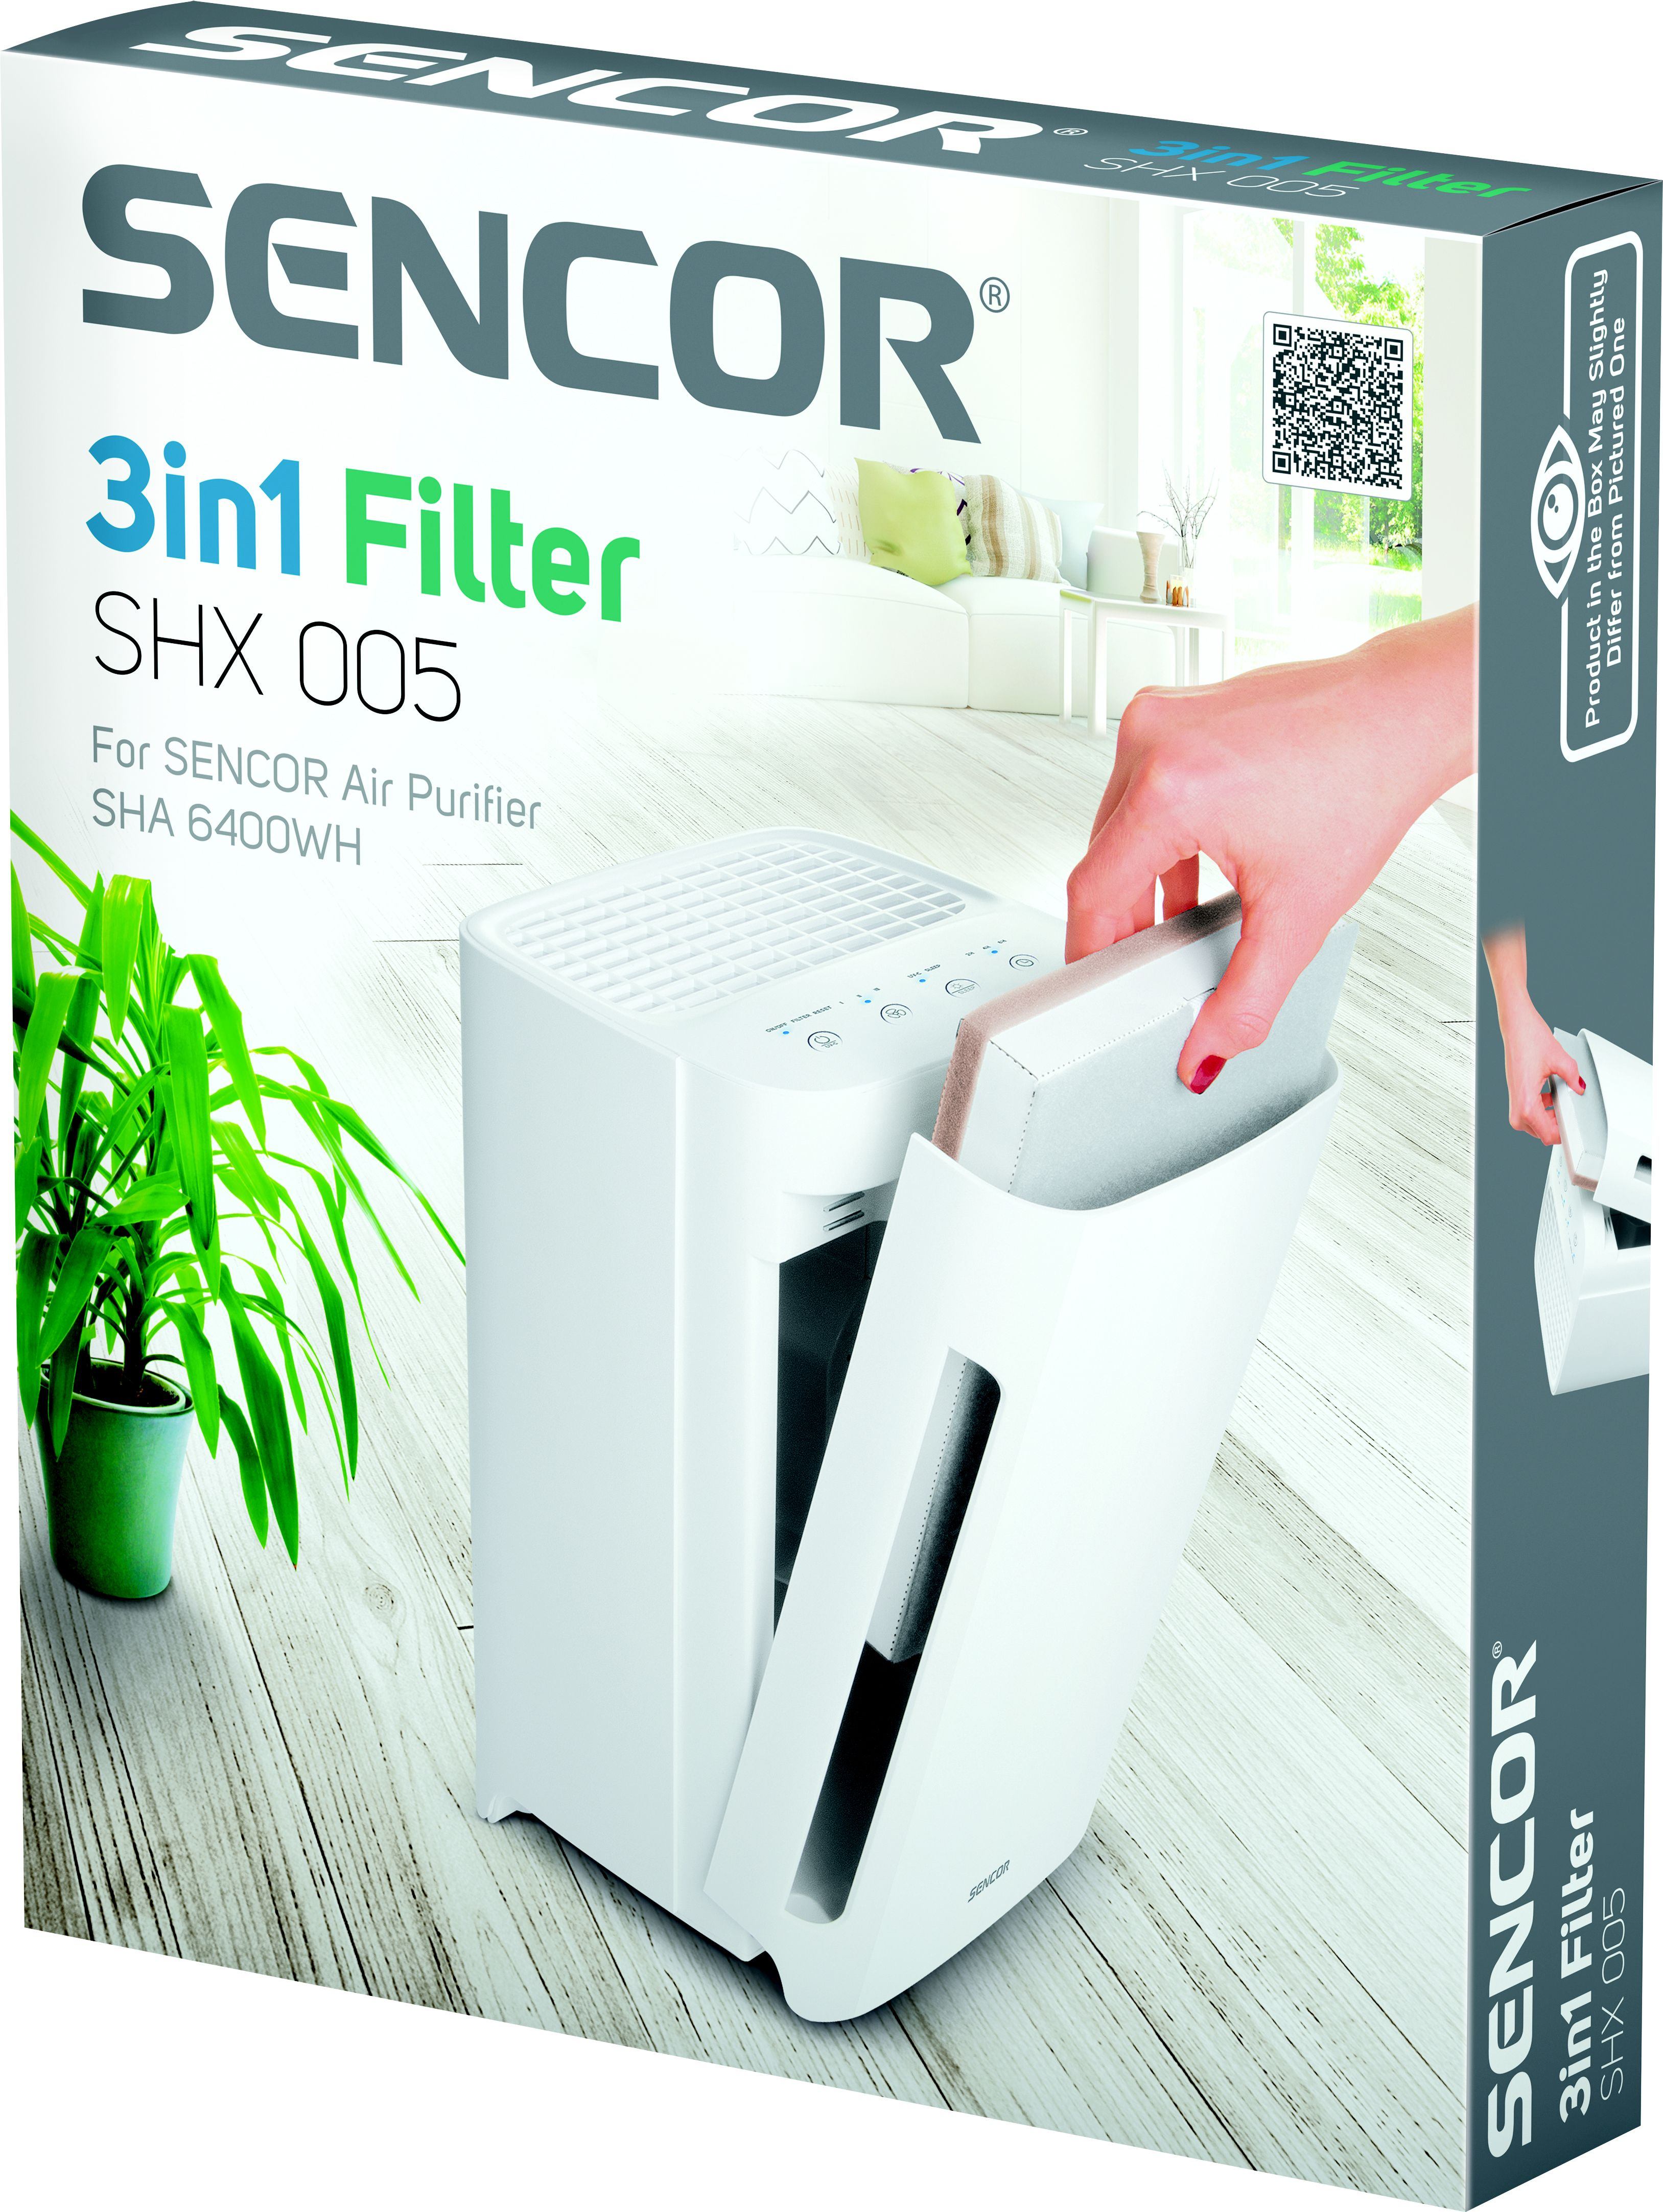 SENCOR SHX 005 filtr pro SHA 6400WH